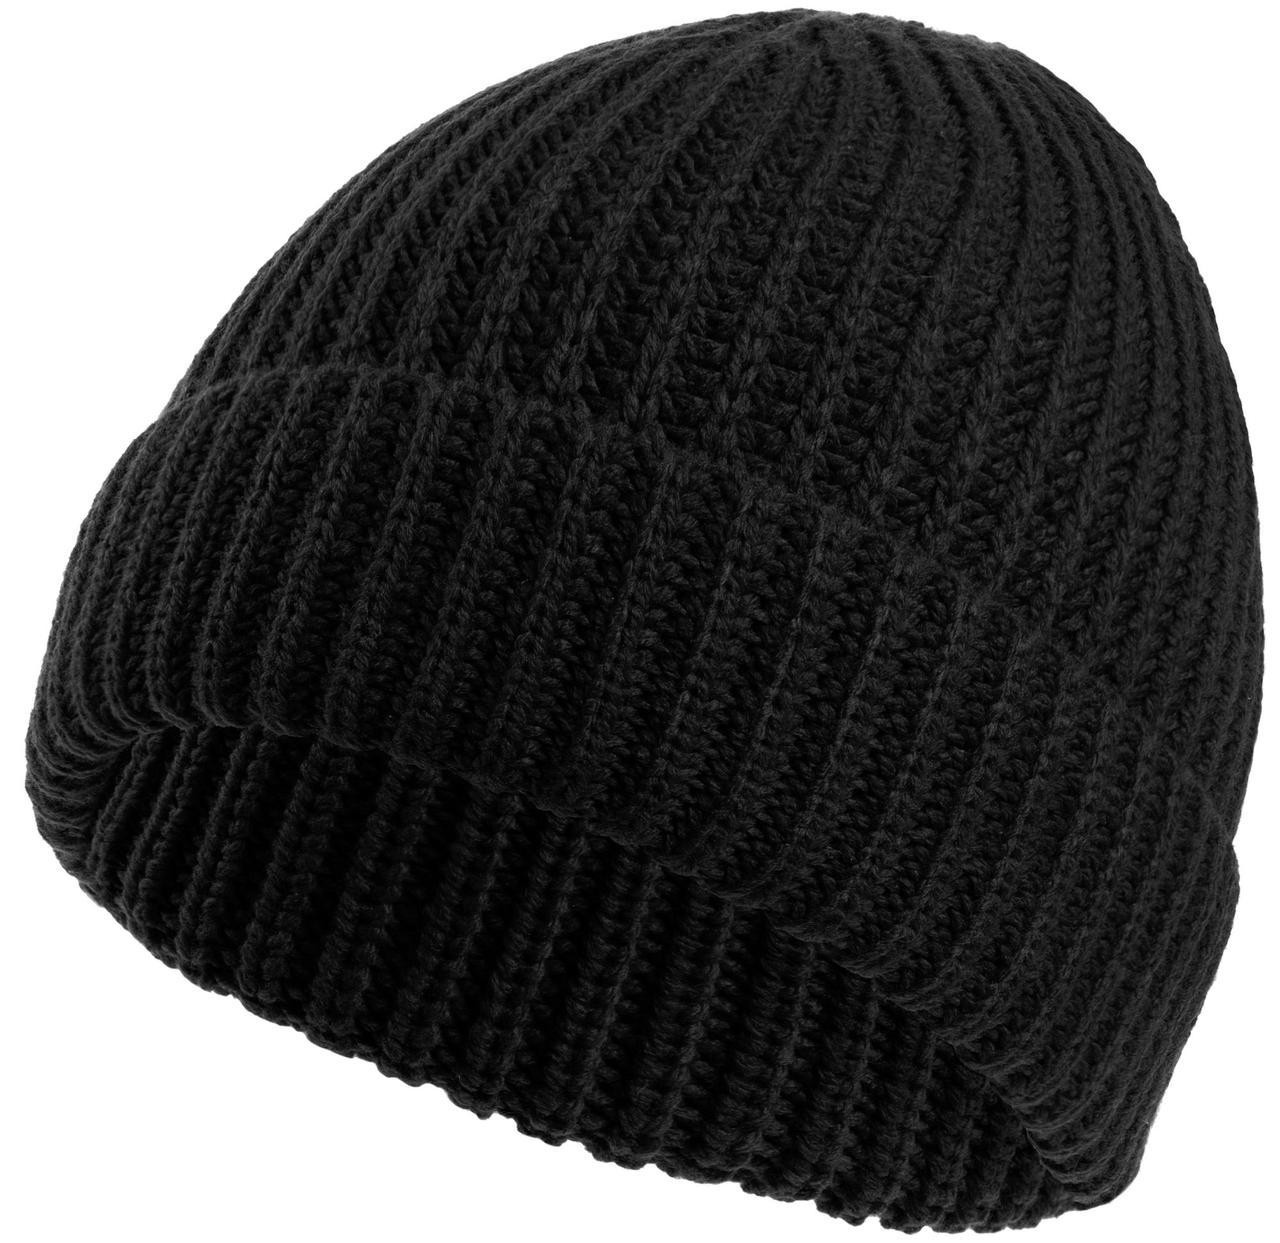 Шапка Nordkapp, черная (артикул 14401.30)